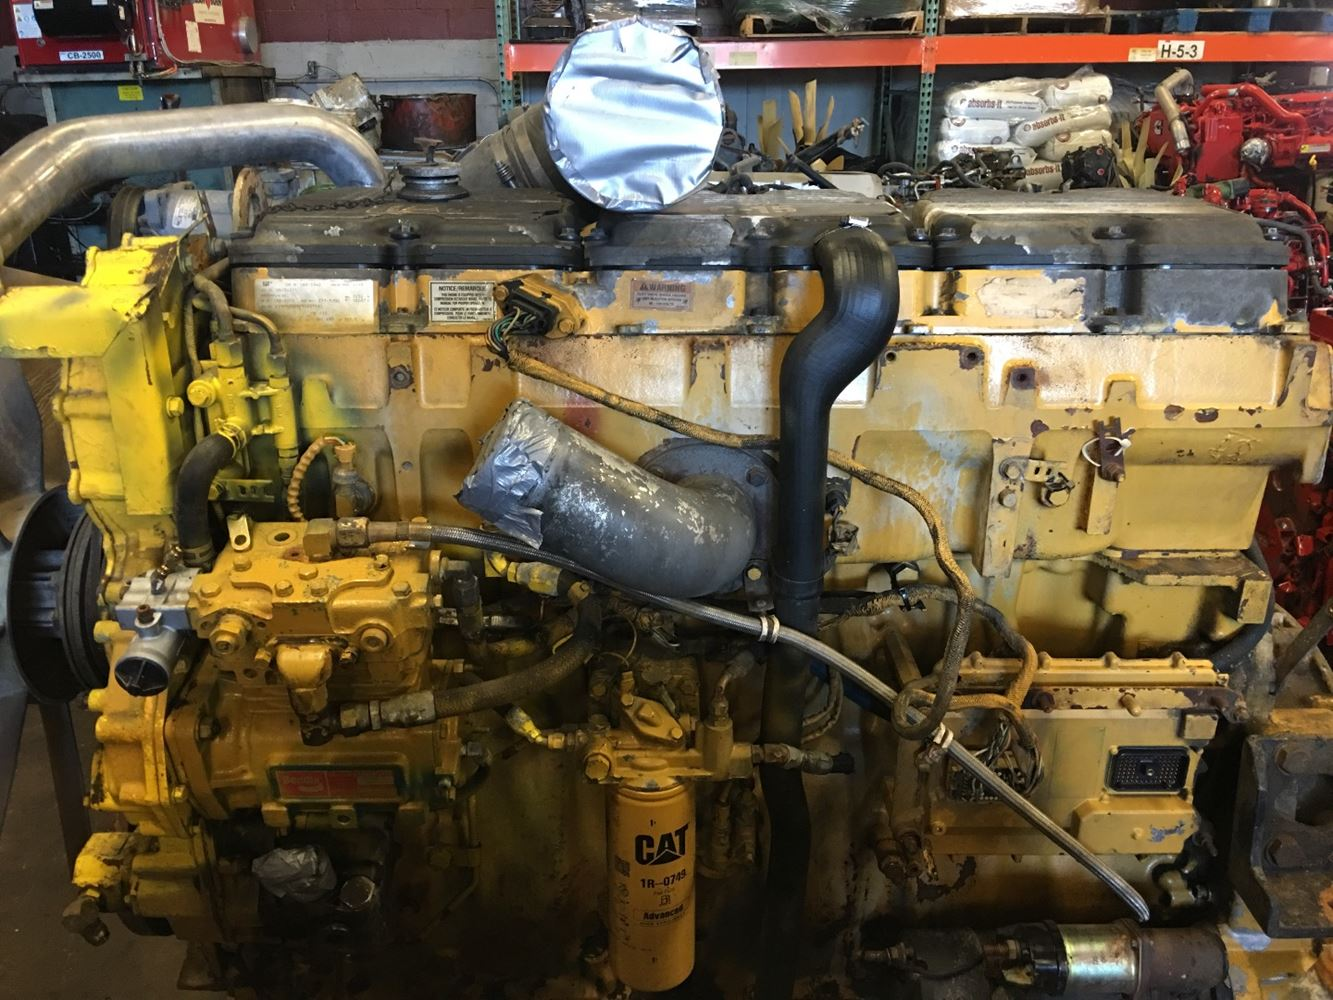 Cat C15 6nz Repair Manuals